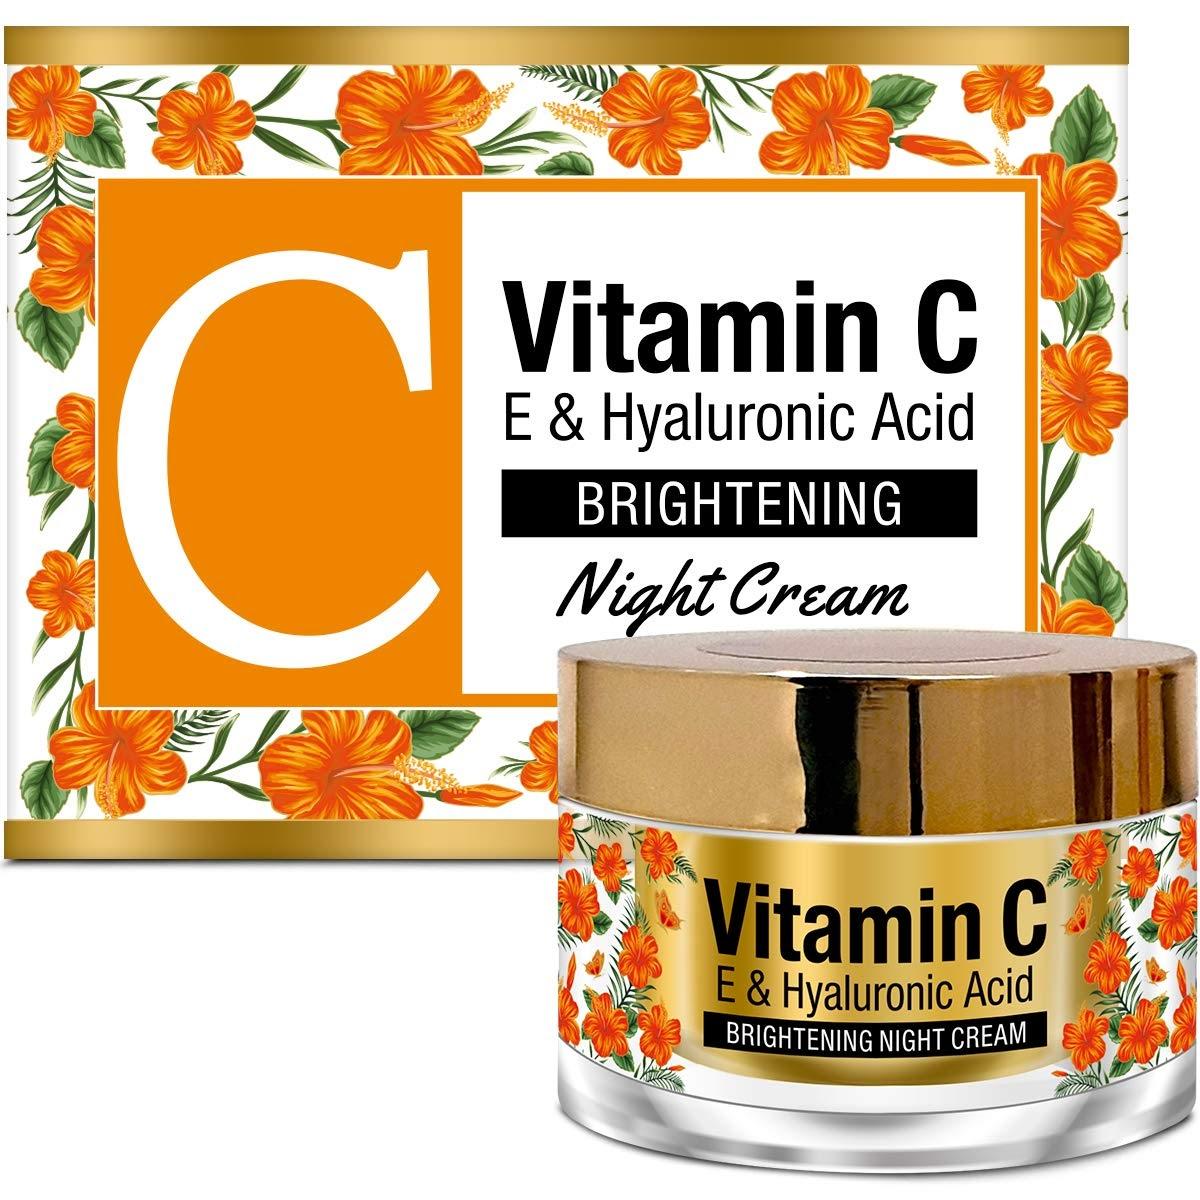 st botanica night cream